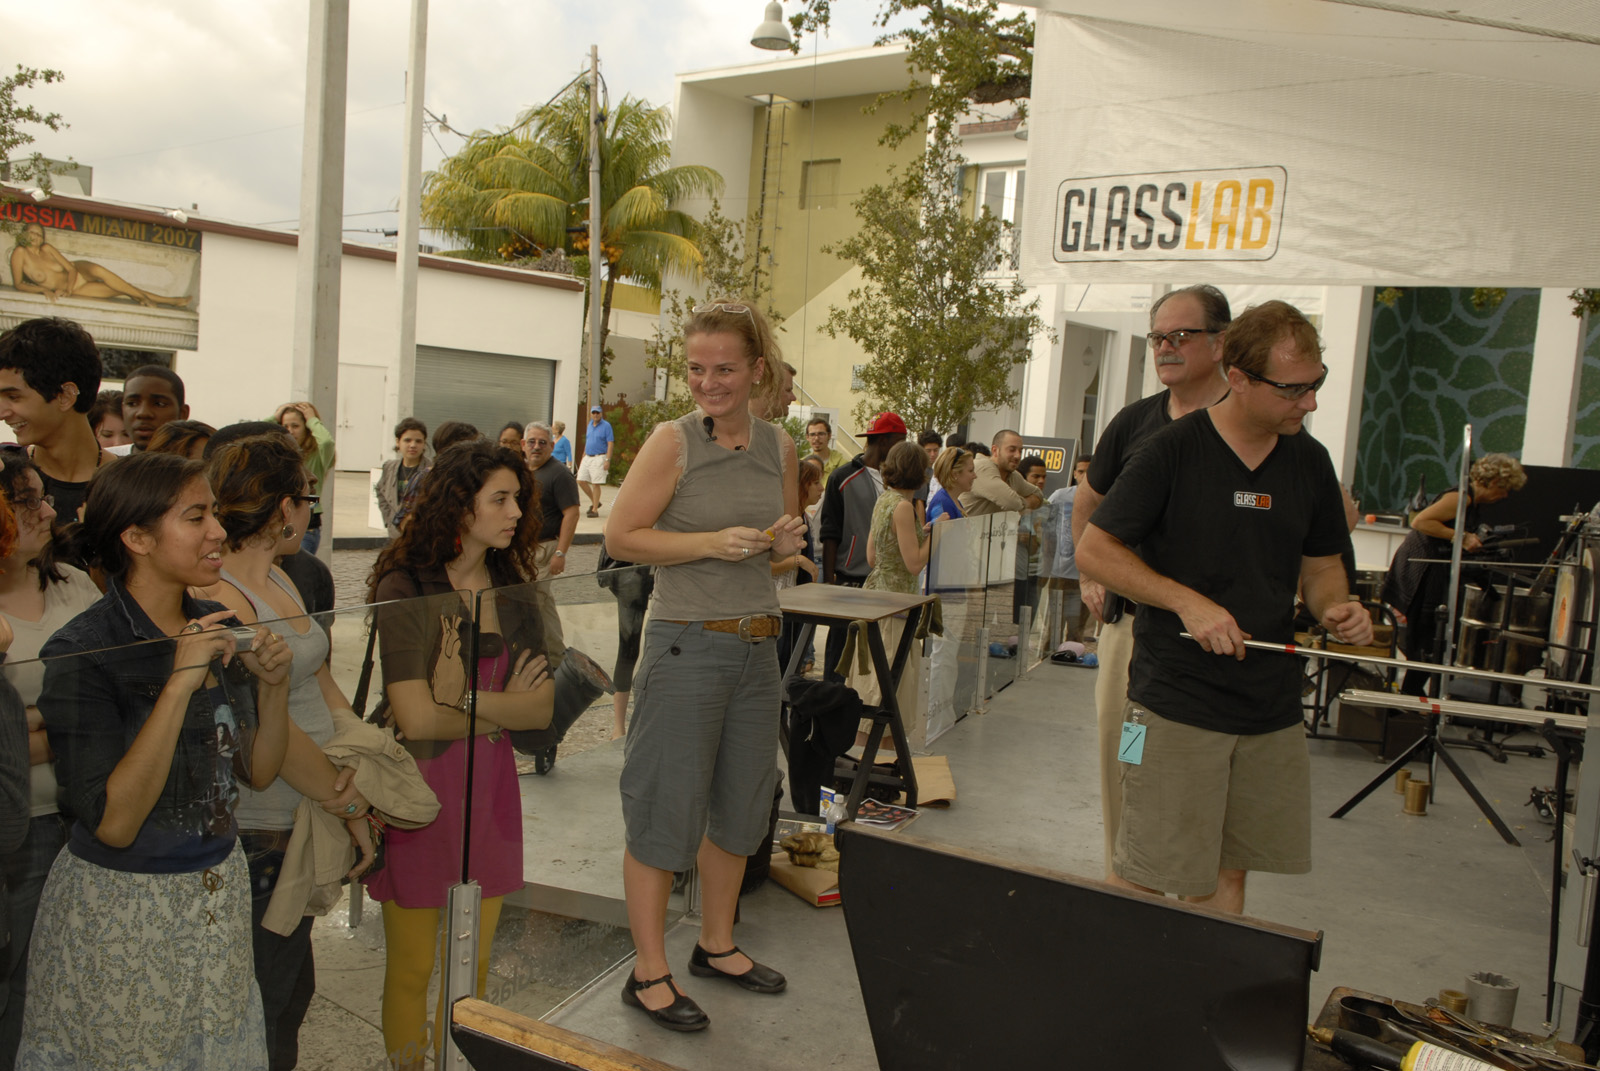 Sigga Heimis at GlassLab at Design Miami 2007